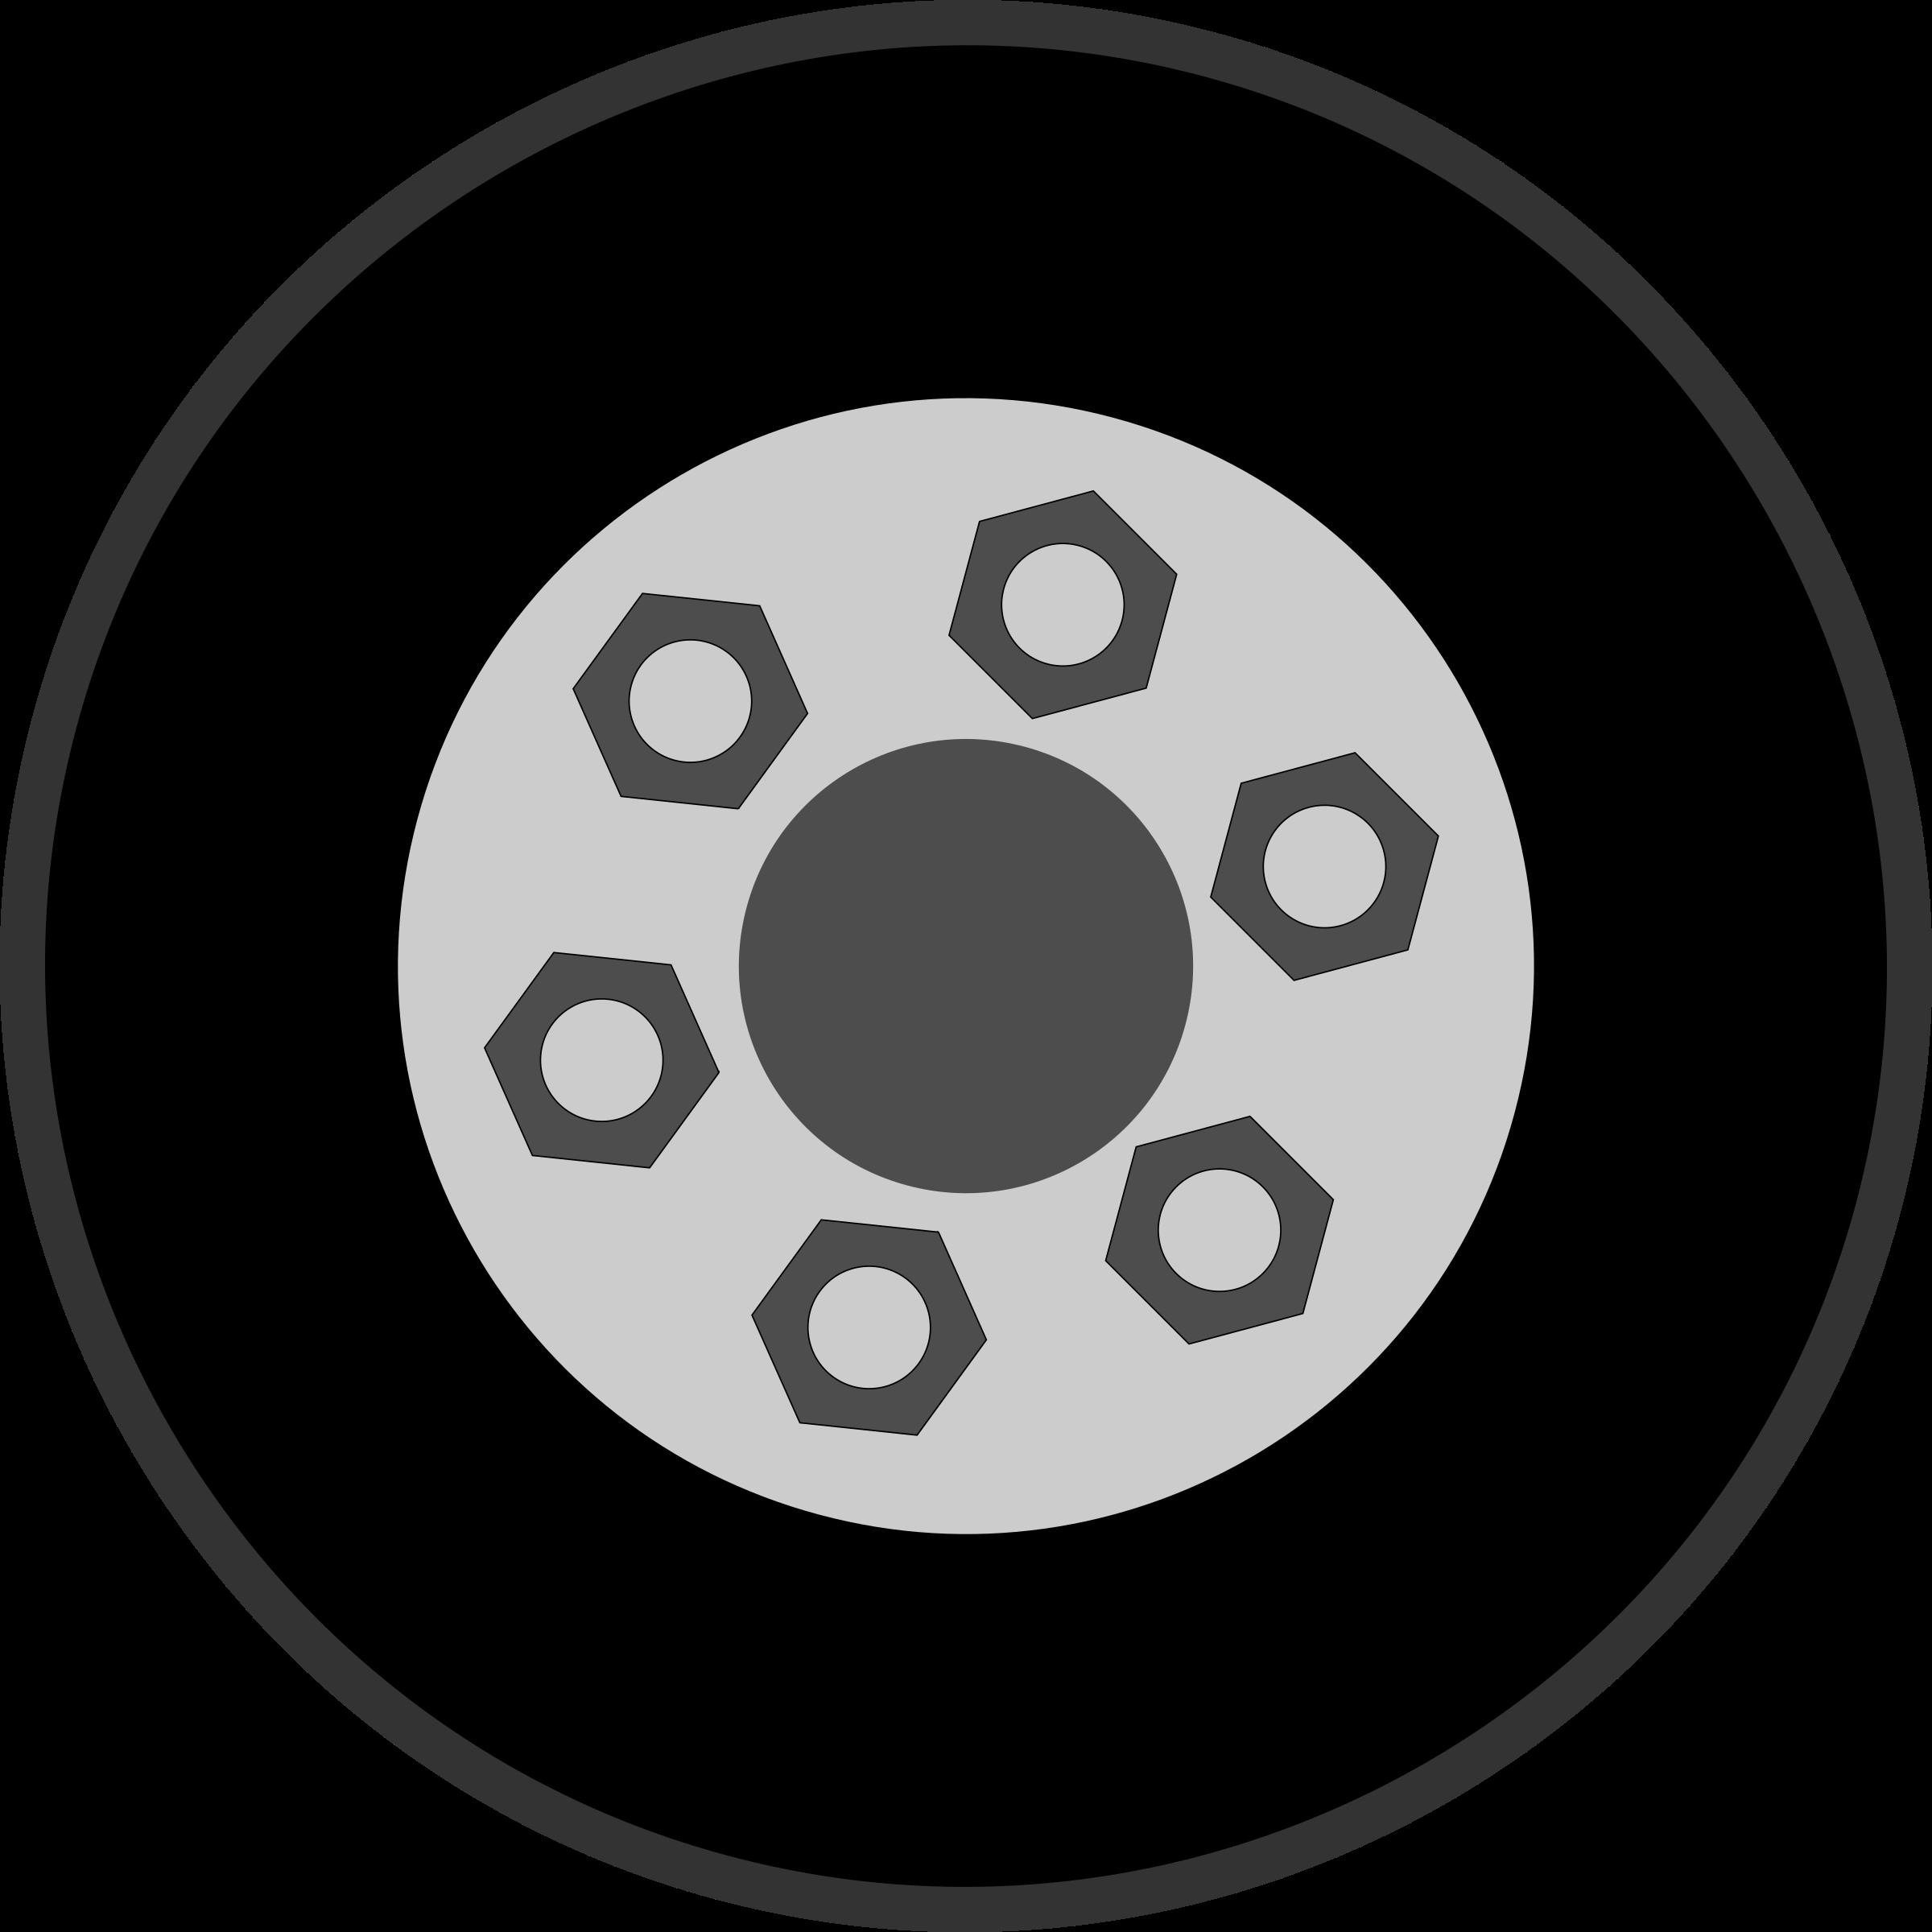 Rueda pneu icons png. Wheel clipart fancy